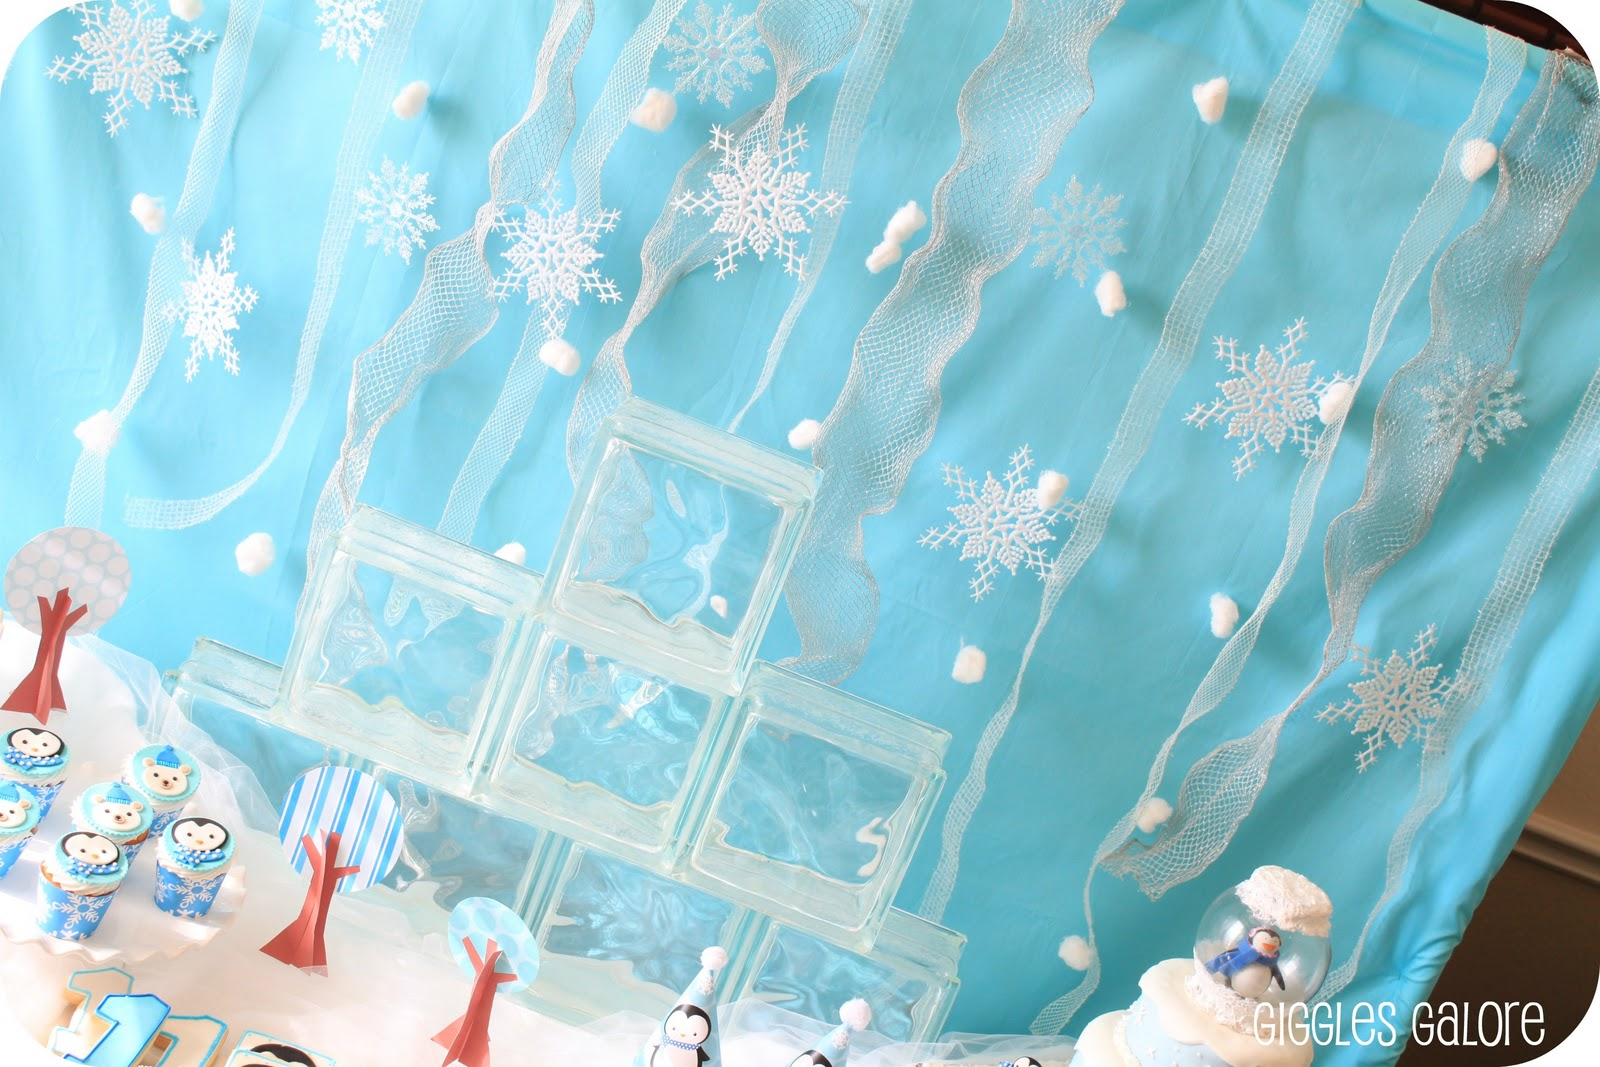 Penguins amp polar bears winter onederland birthday party giggles